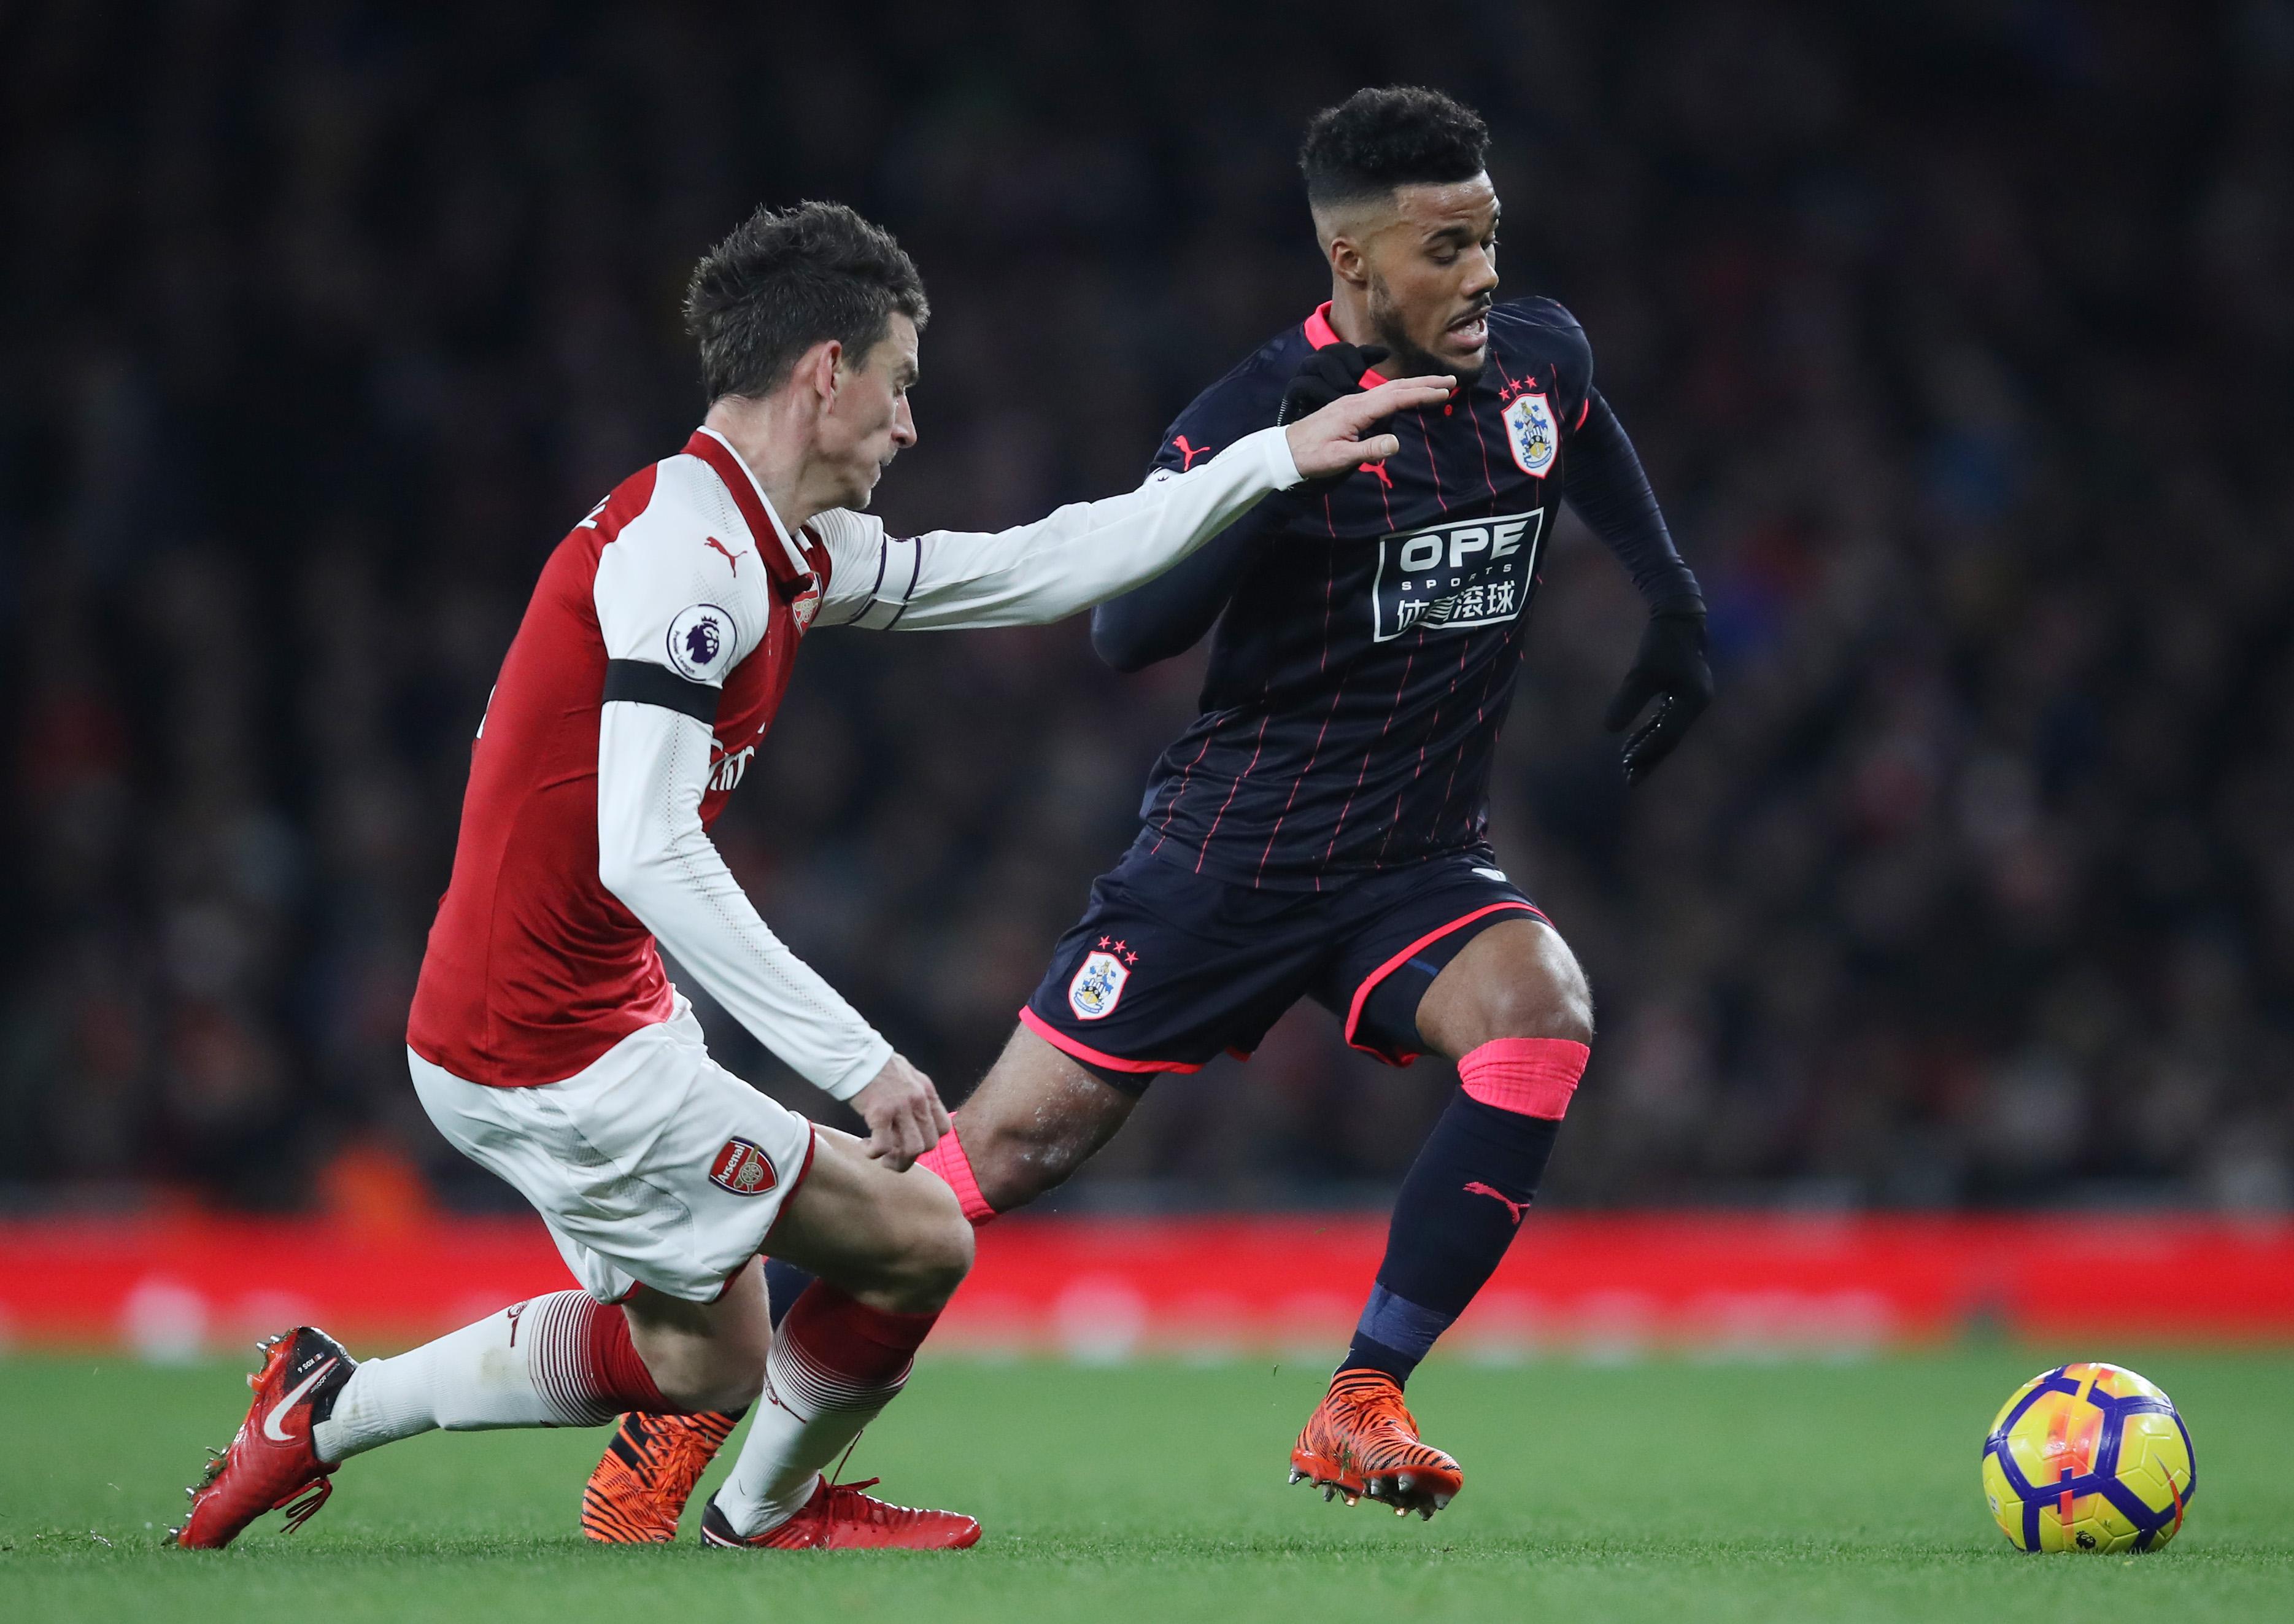 Huddersfield Vs Arsenal: Arsenal Vs Huddersfield Town: 5 Things We Learned